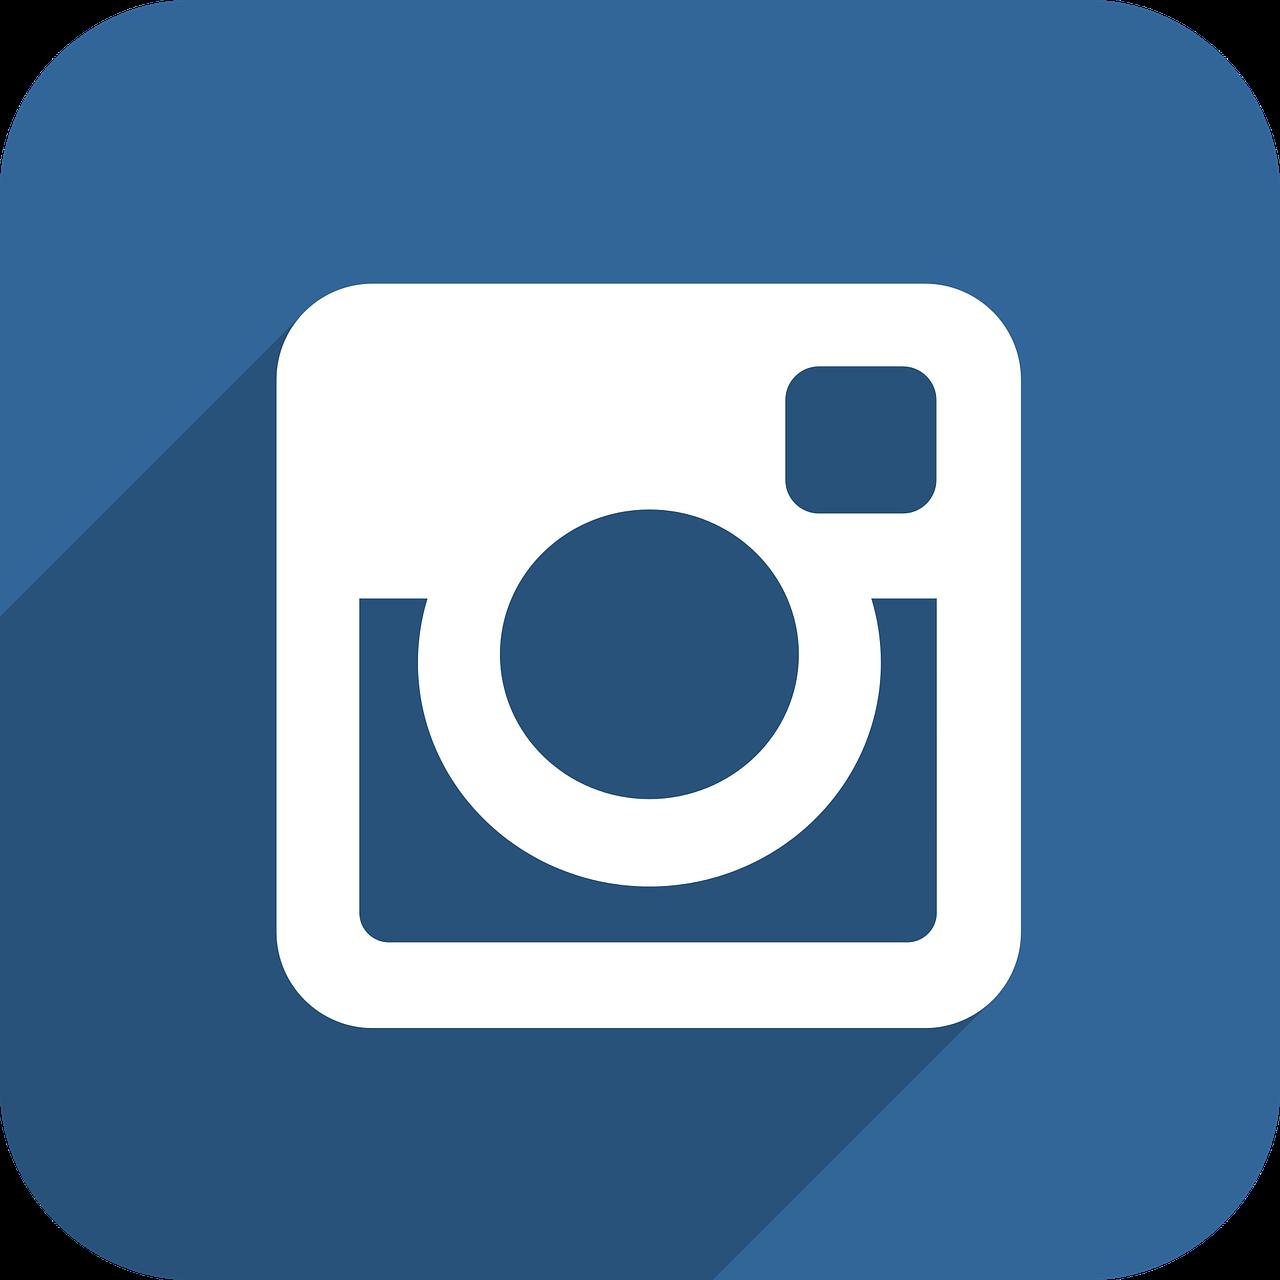 Аву, картинки иконка инстаграмм